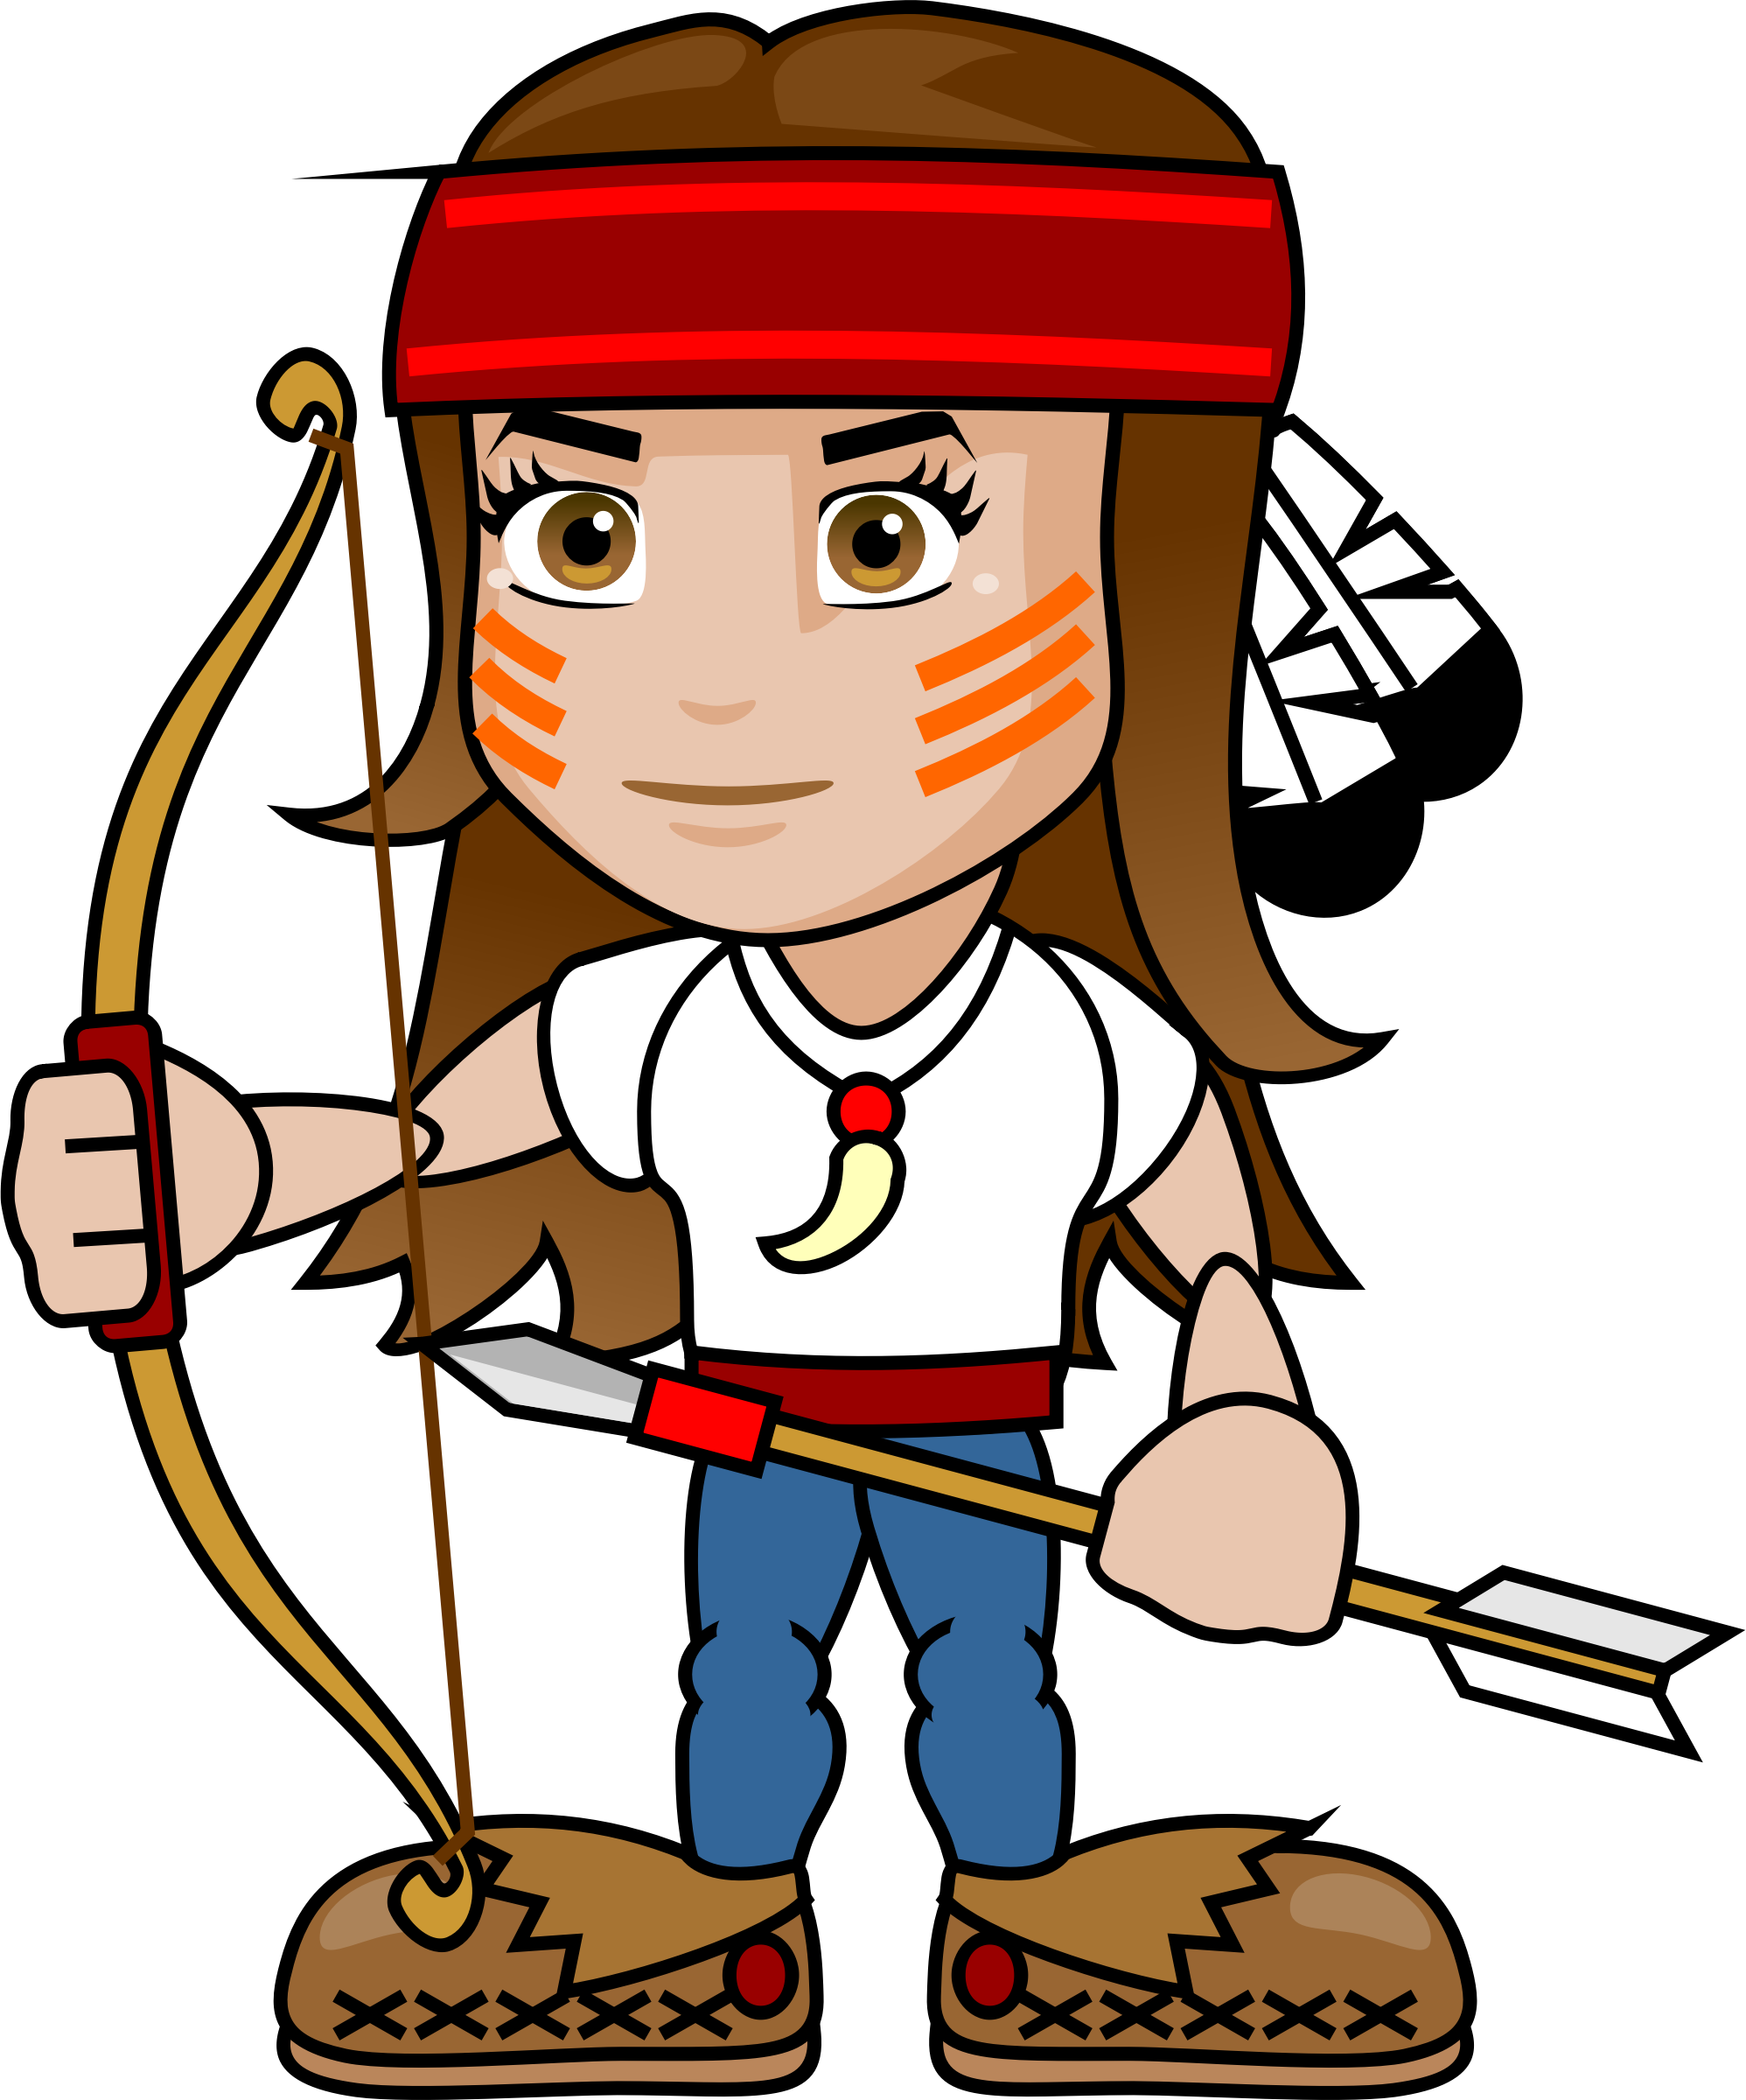 Girls clipart construction worker. Girl archer big image